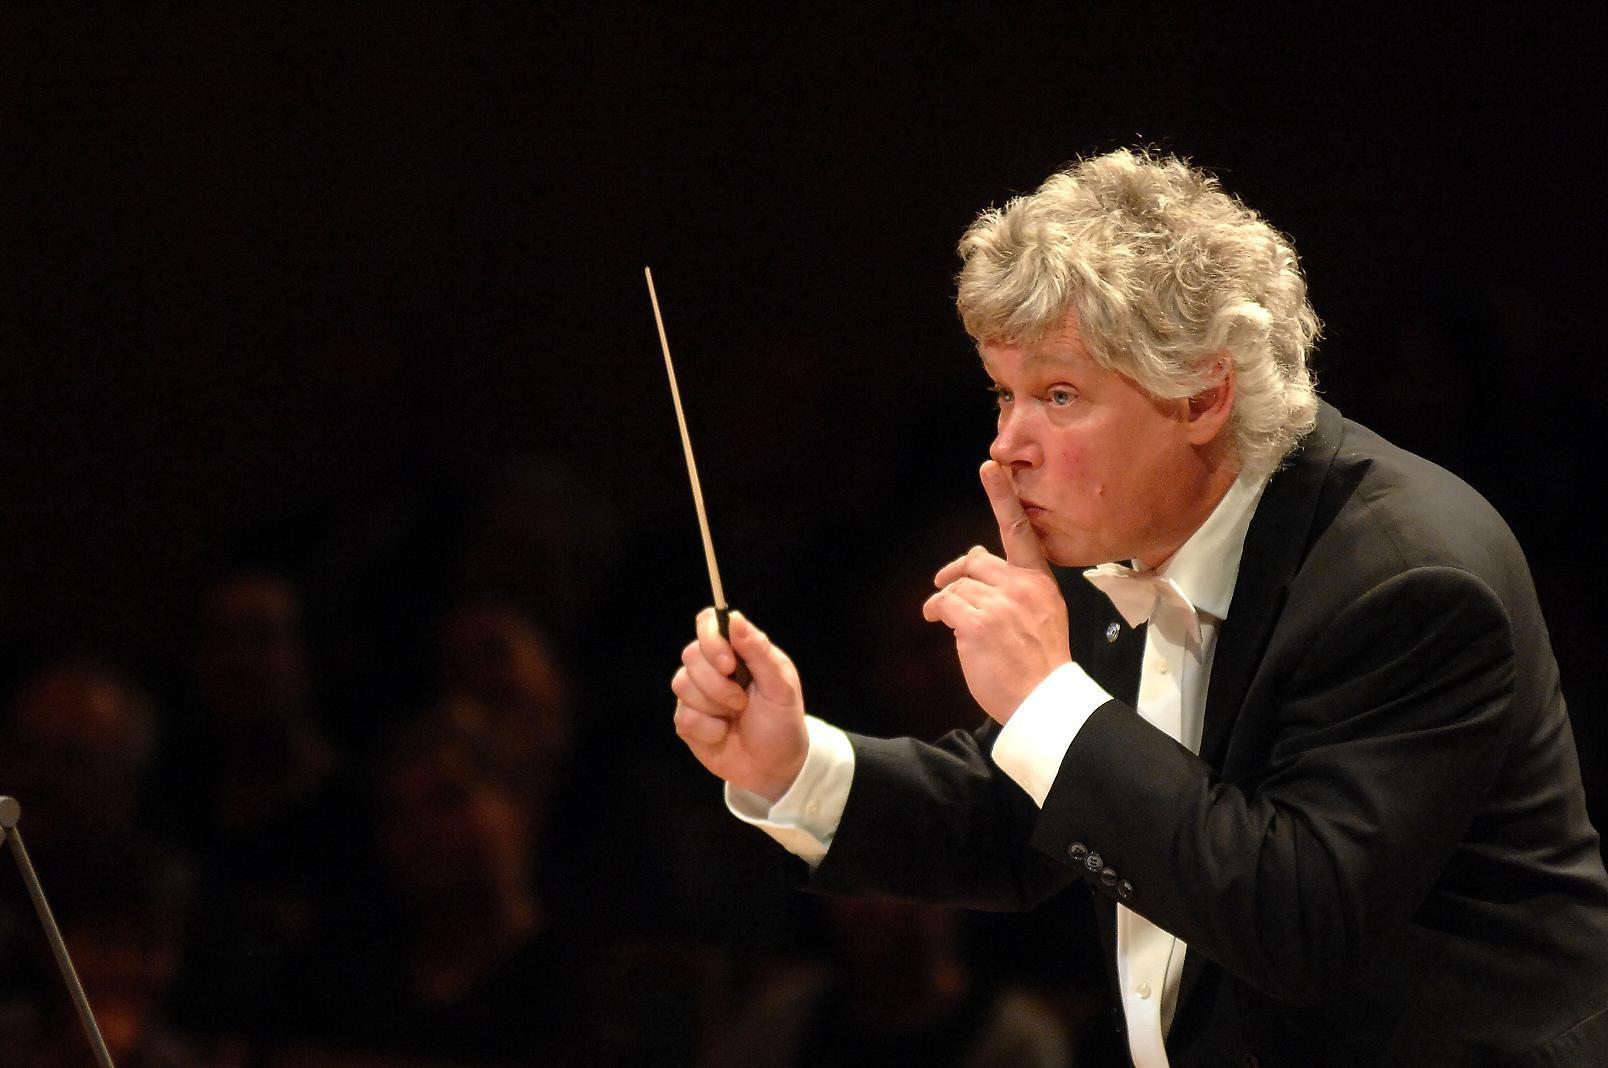 Nemzeti Filharmonikusok Kocsis Zoltán Jean-Efflam Bavouzet WWF Bokor Lilla